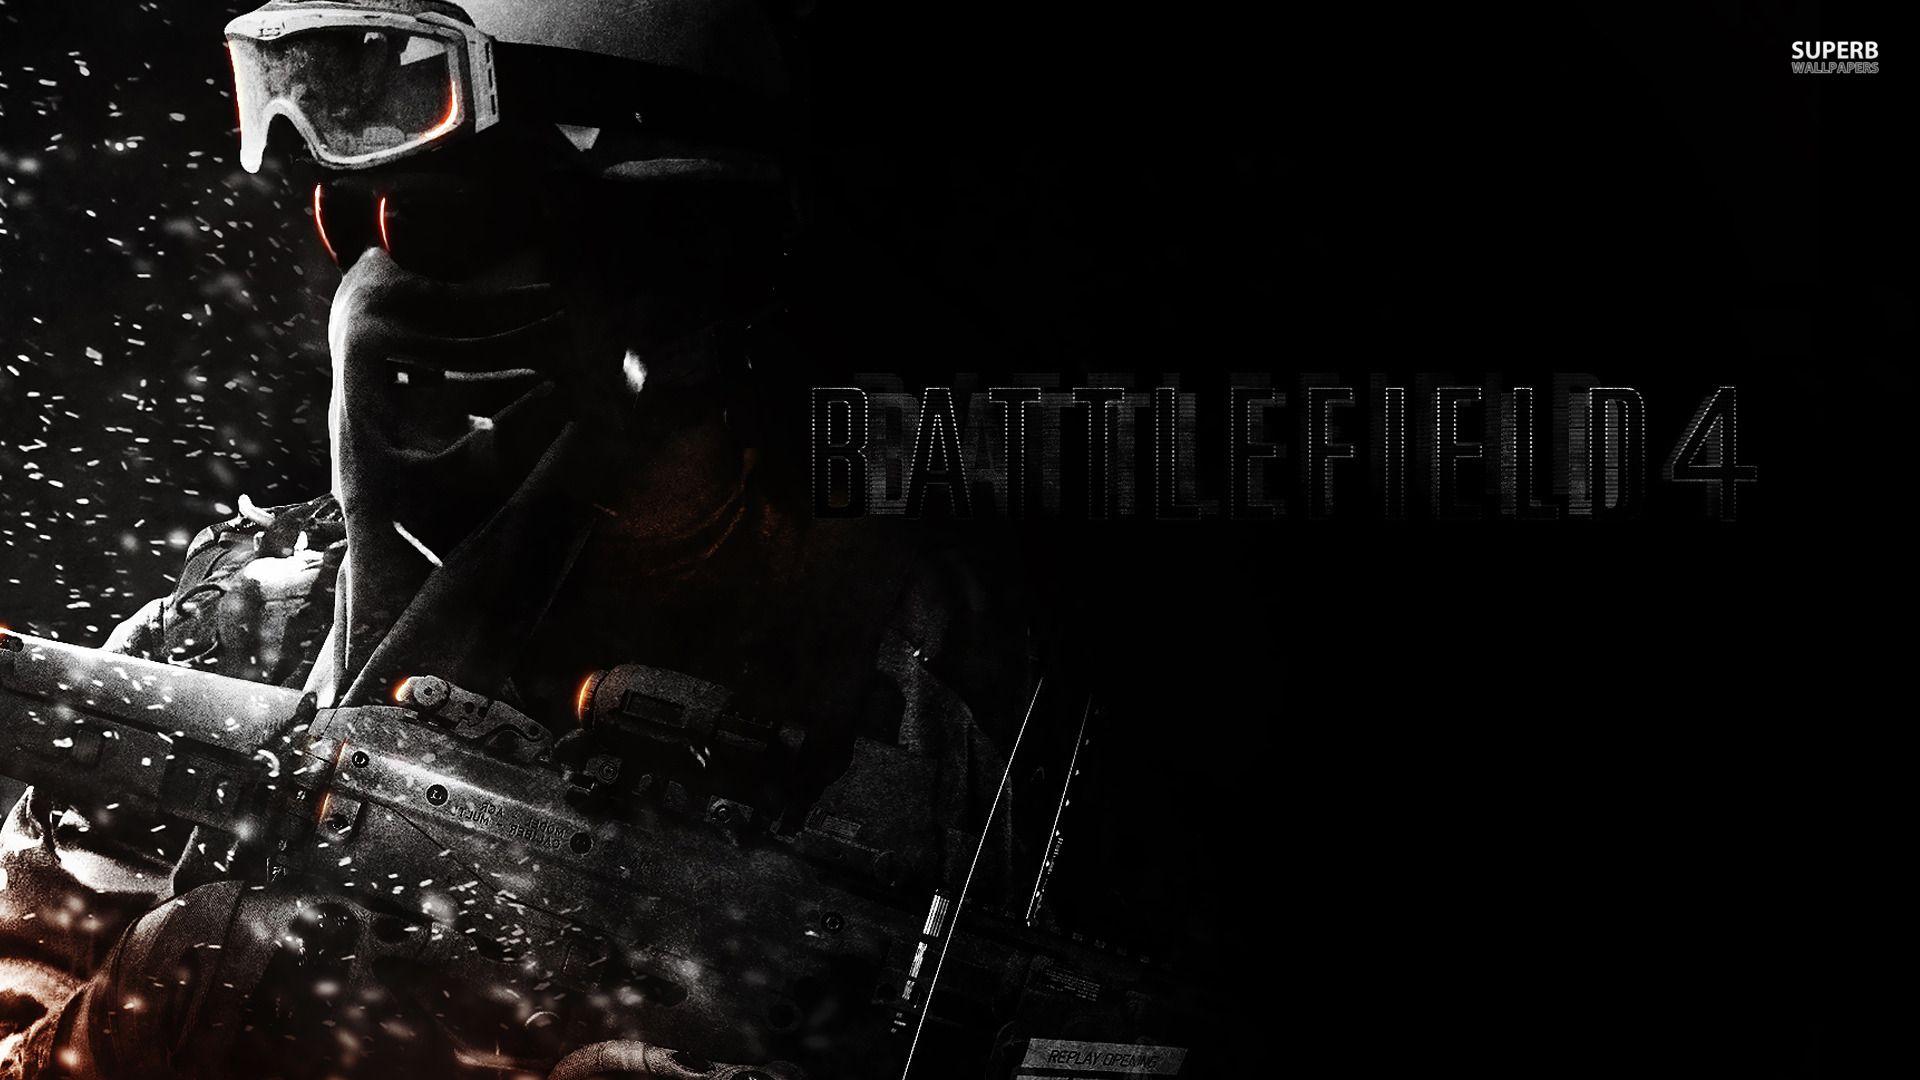 Battlefield hd wallpapers p gallery gamer enthusiast 1920993 battlefield hd wallpapers p gallery gamer enthusiast 1920993 battlefield 4 hd wallpapers 40 voltagebd Gallery